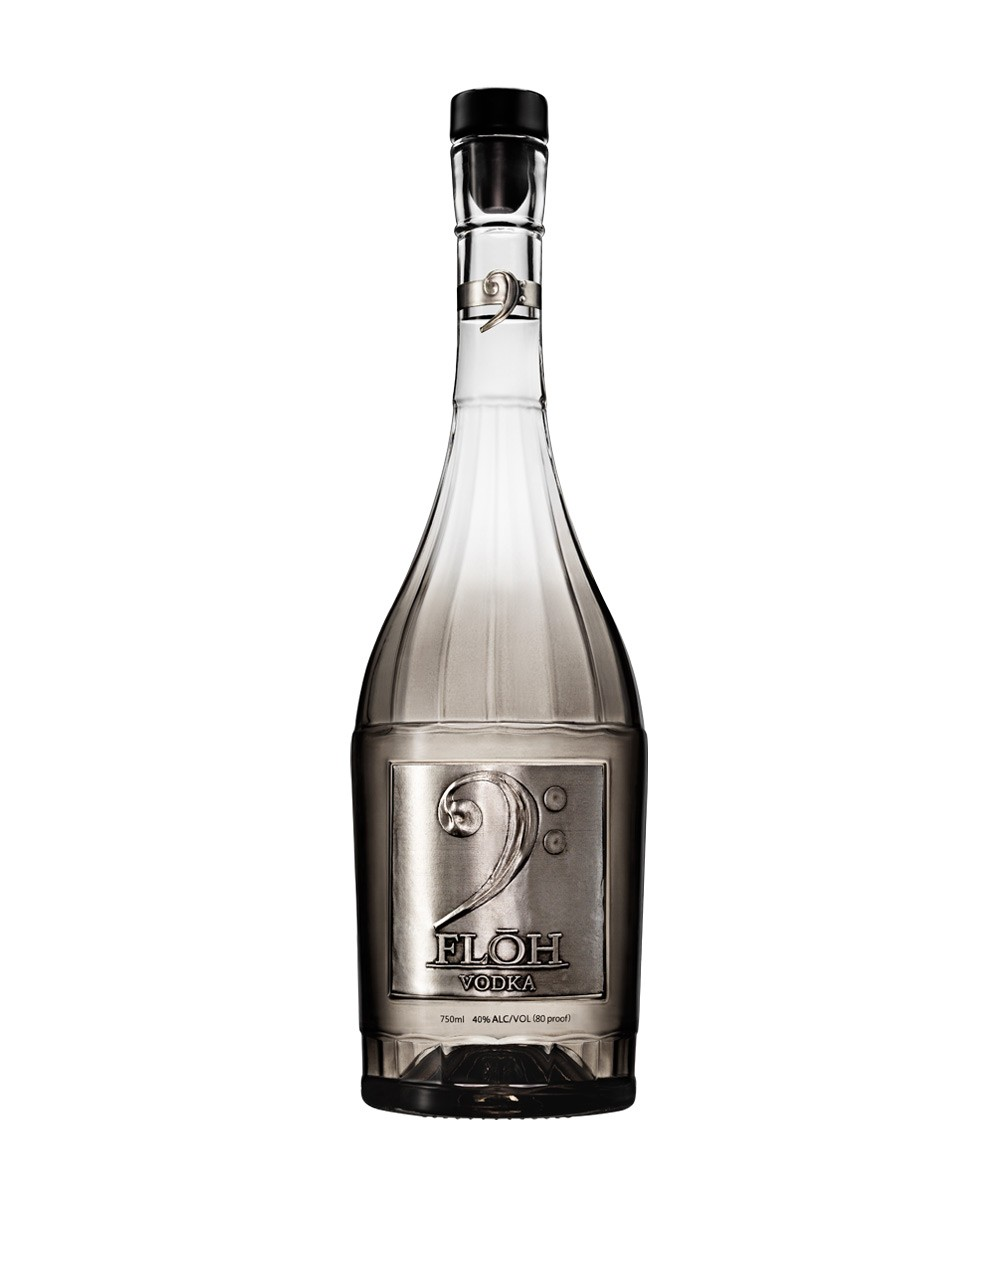 FLOH Vodka  Buy Online or Send as a Gift  ReserveBar